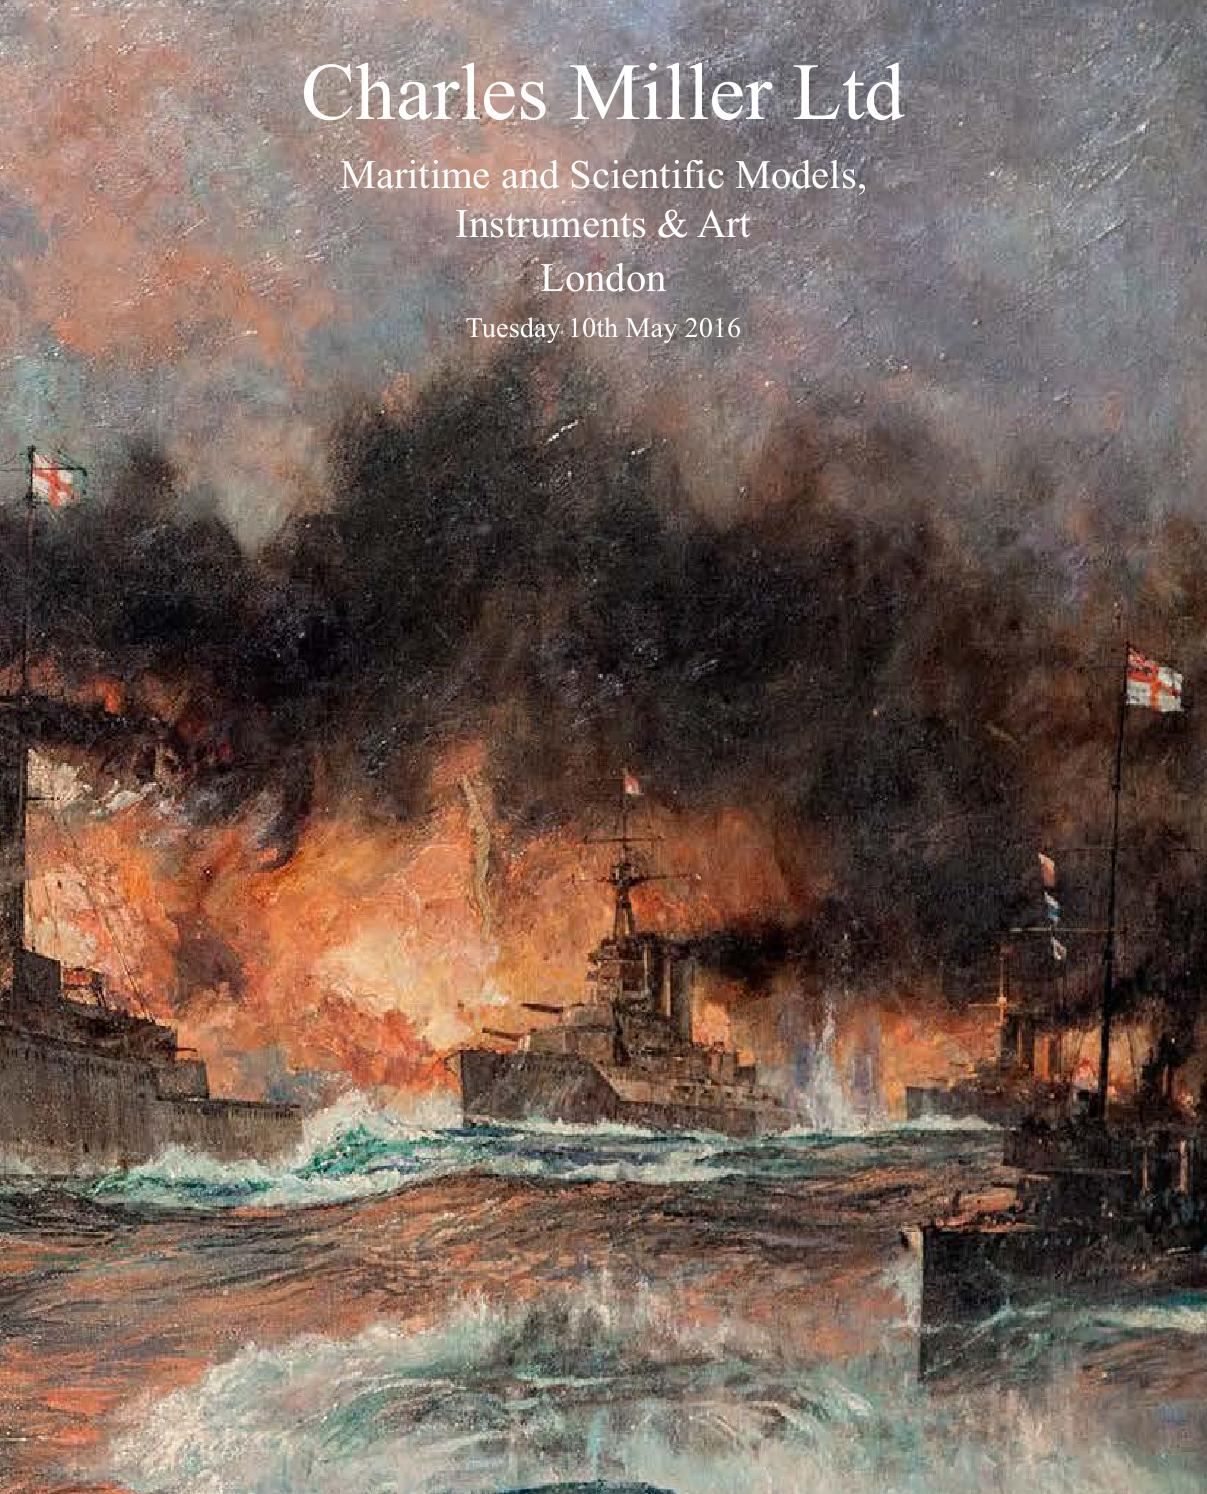 LIMITED EDITION ART 25 HMS DIADEM